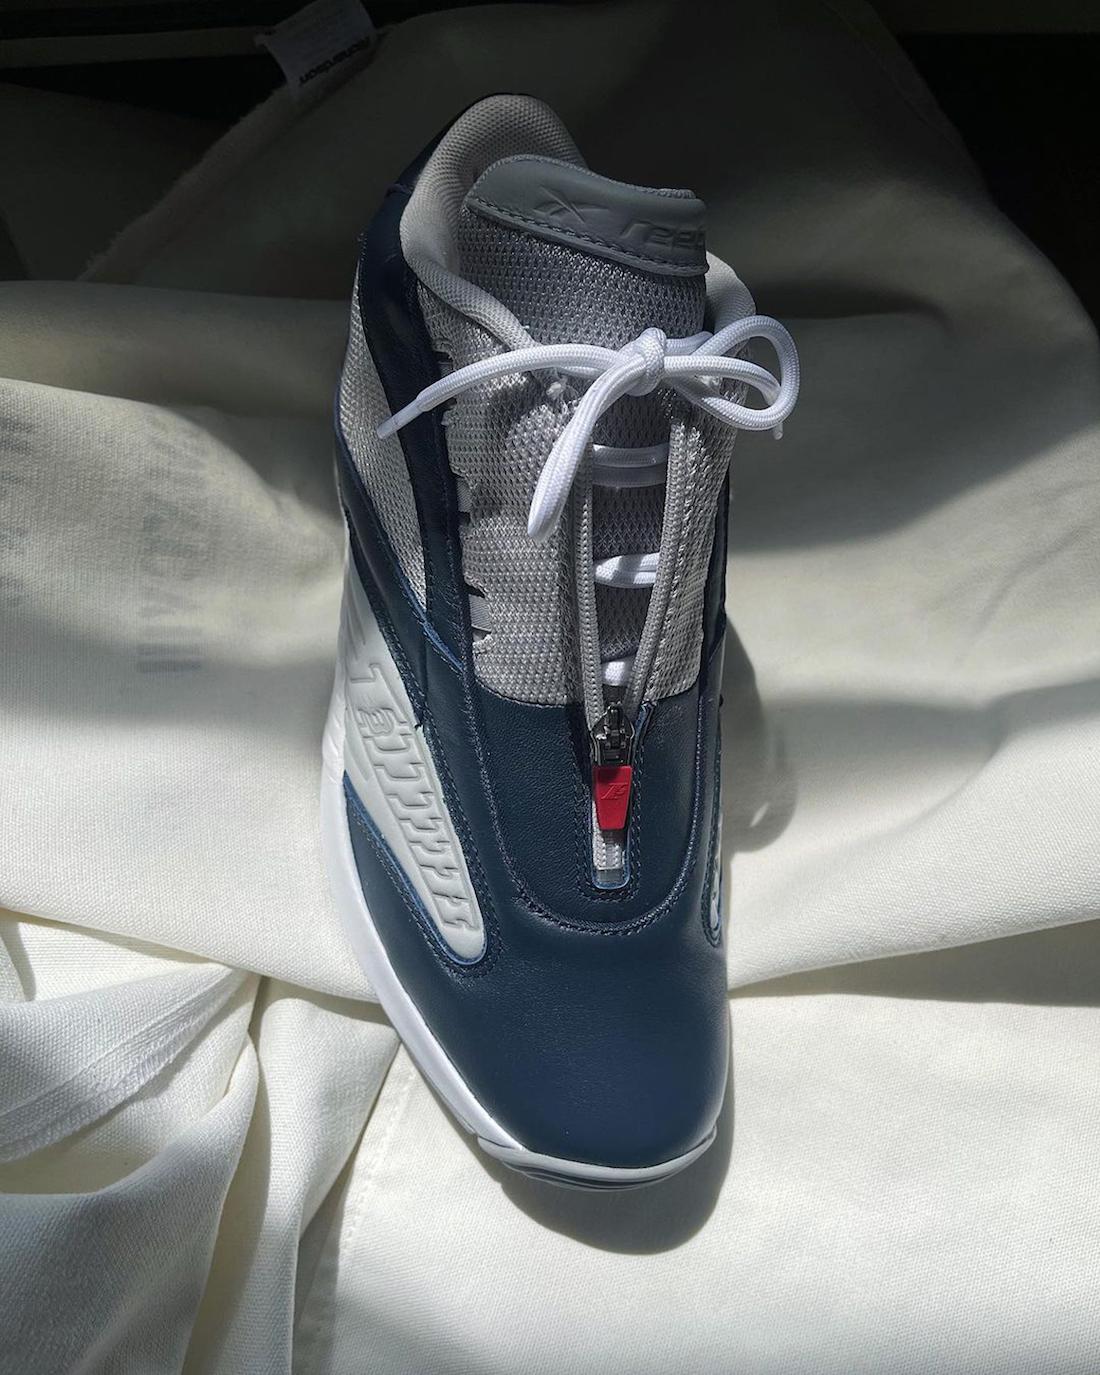 Packer Shoes Reebok Answer IV Prada Release Date Info